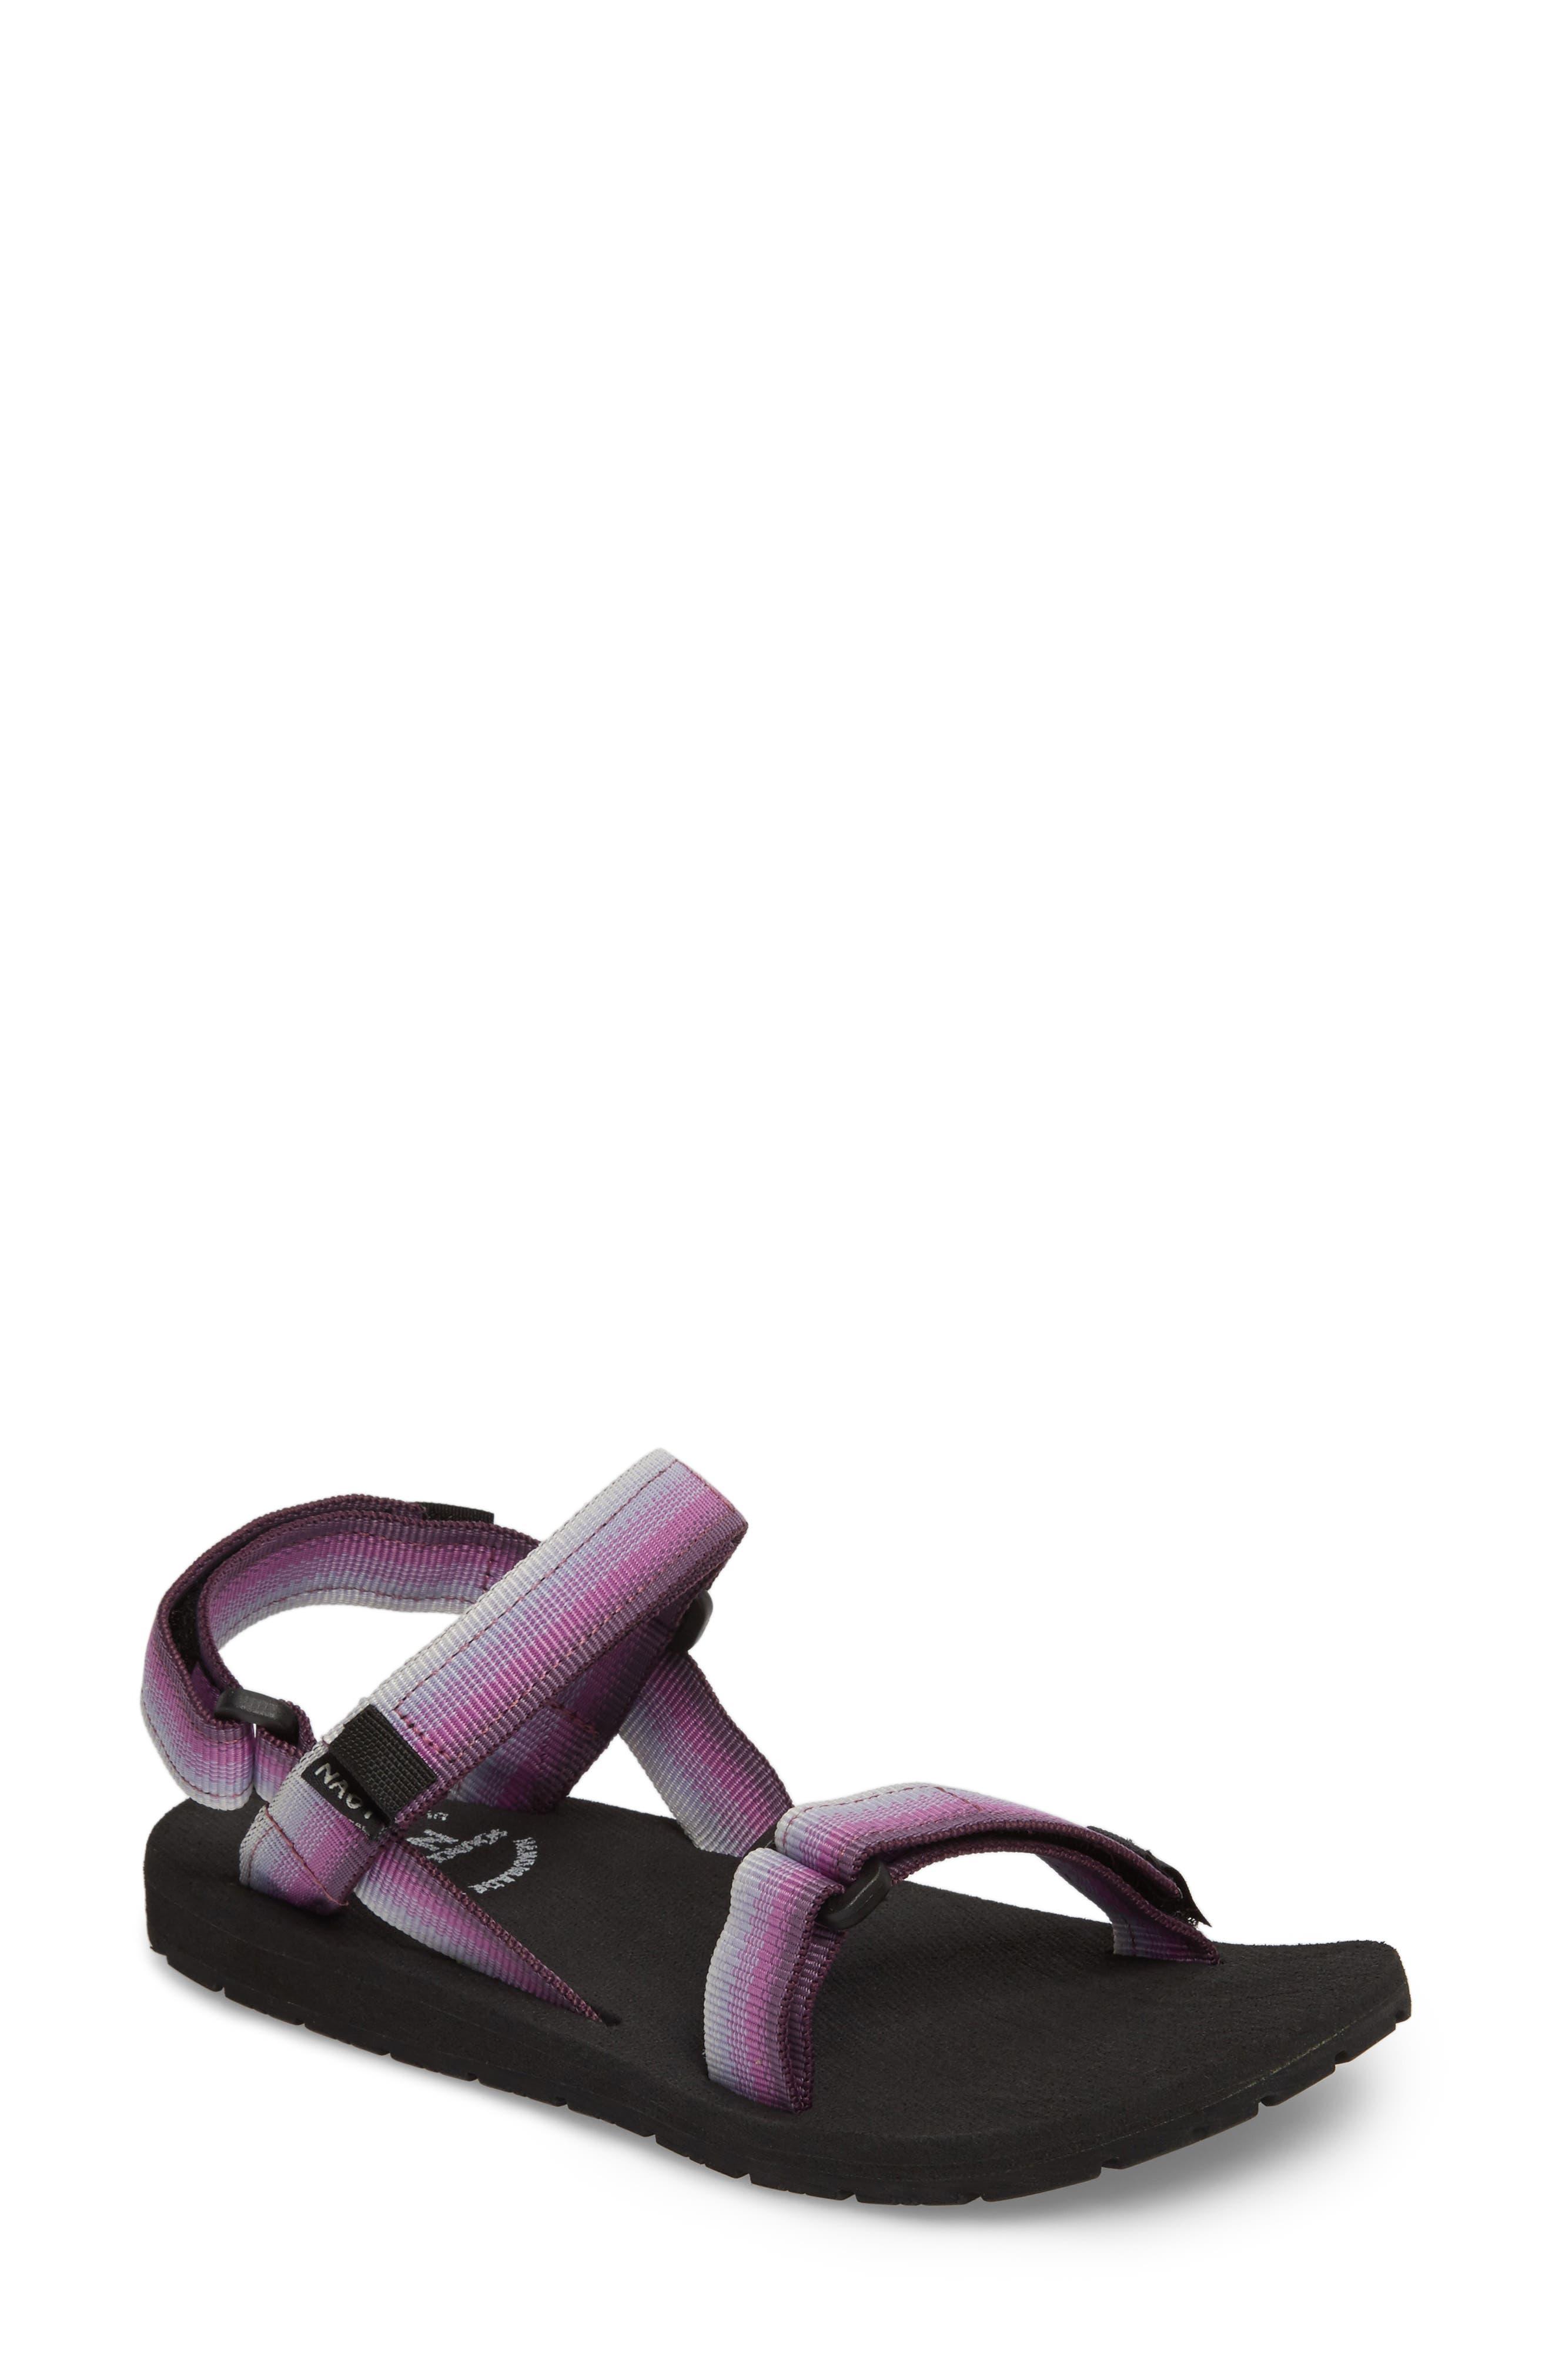 Haven Waterproof Sandal,                         Main,                         color, Purple Sunset Fabric